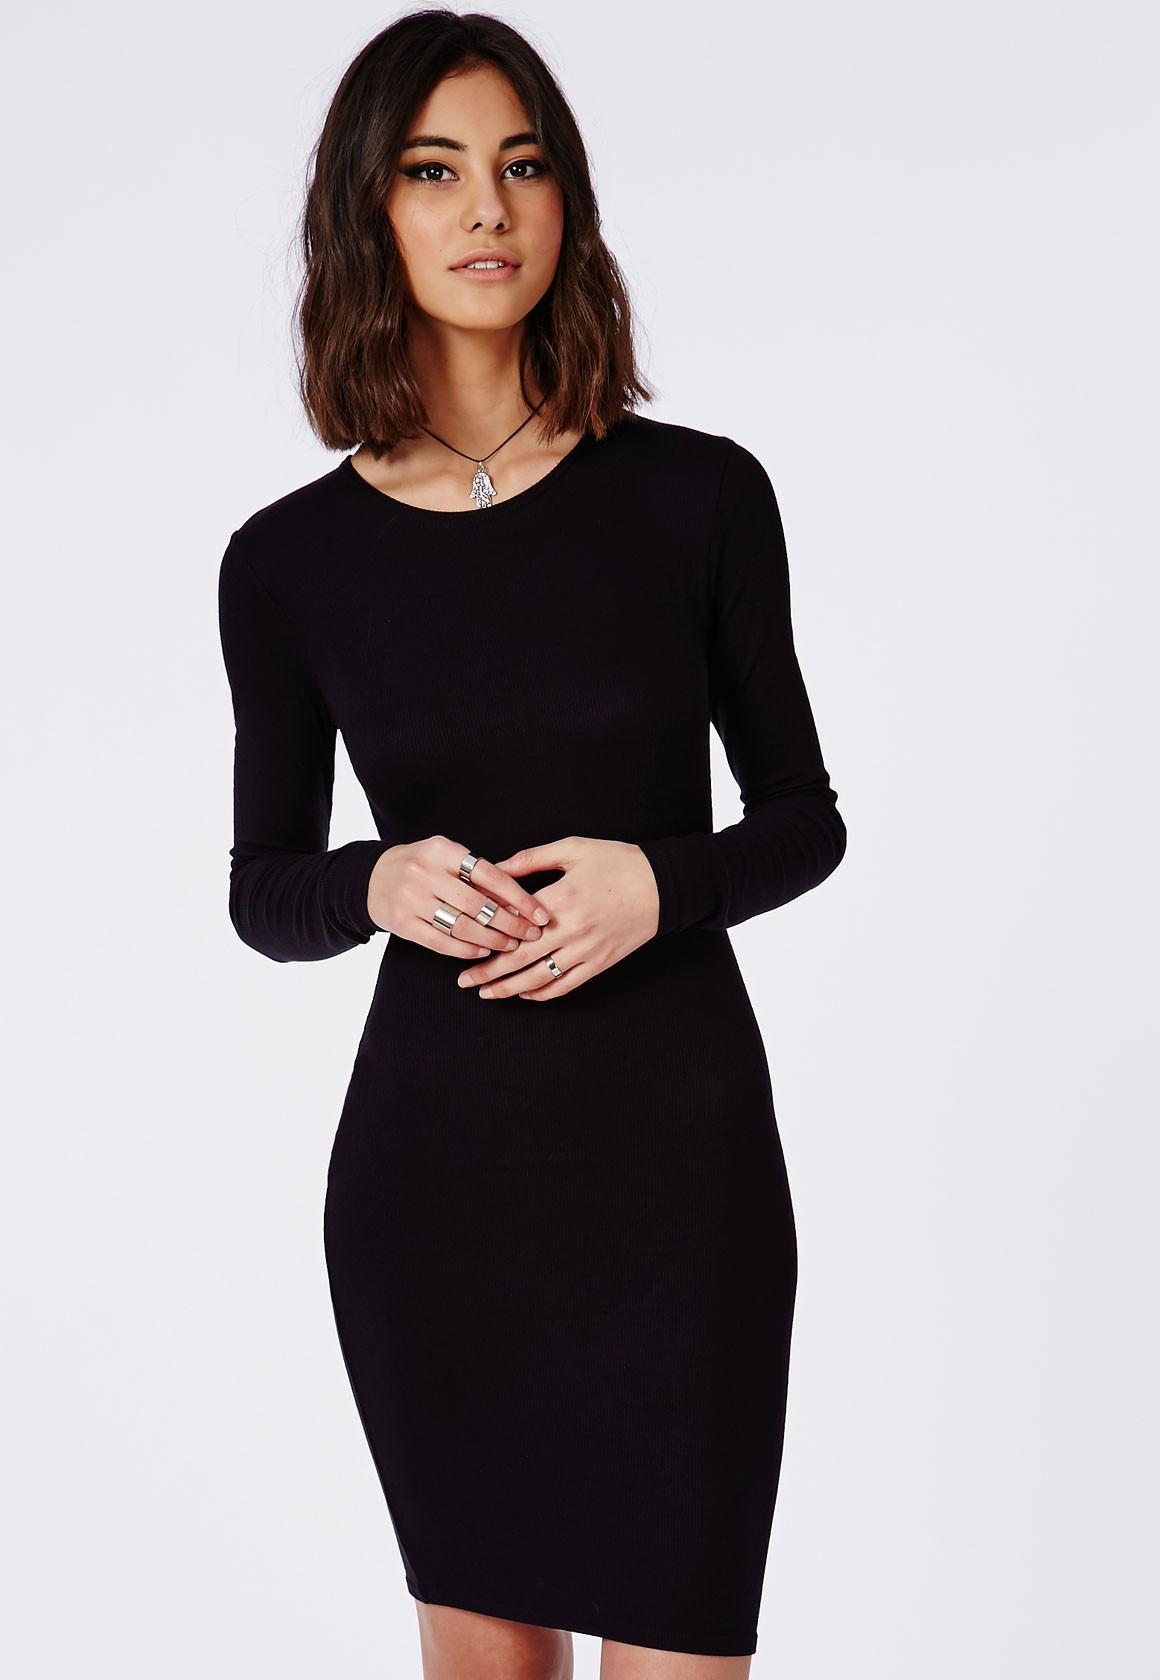 Robe noir manches longues